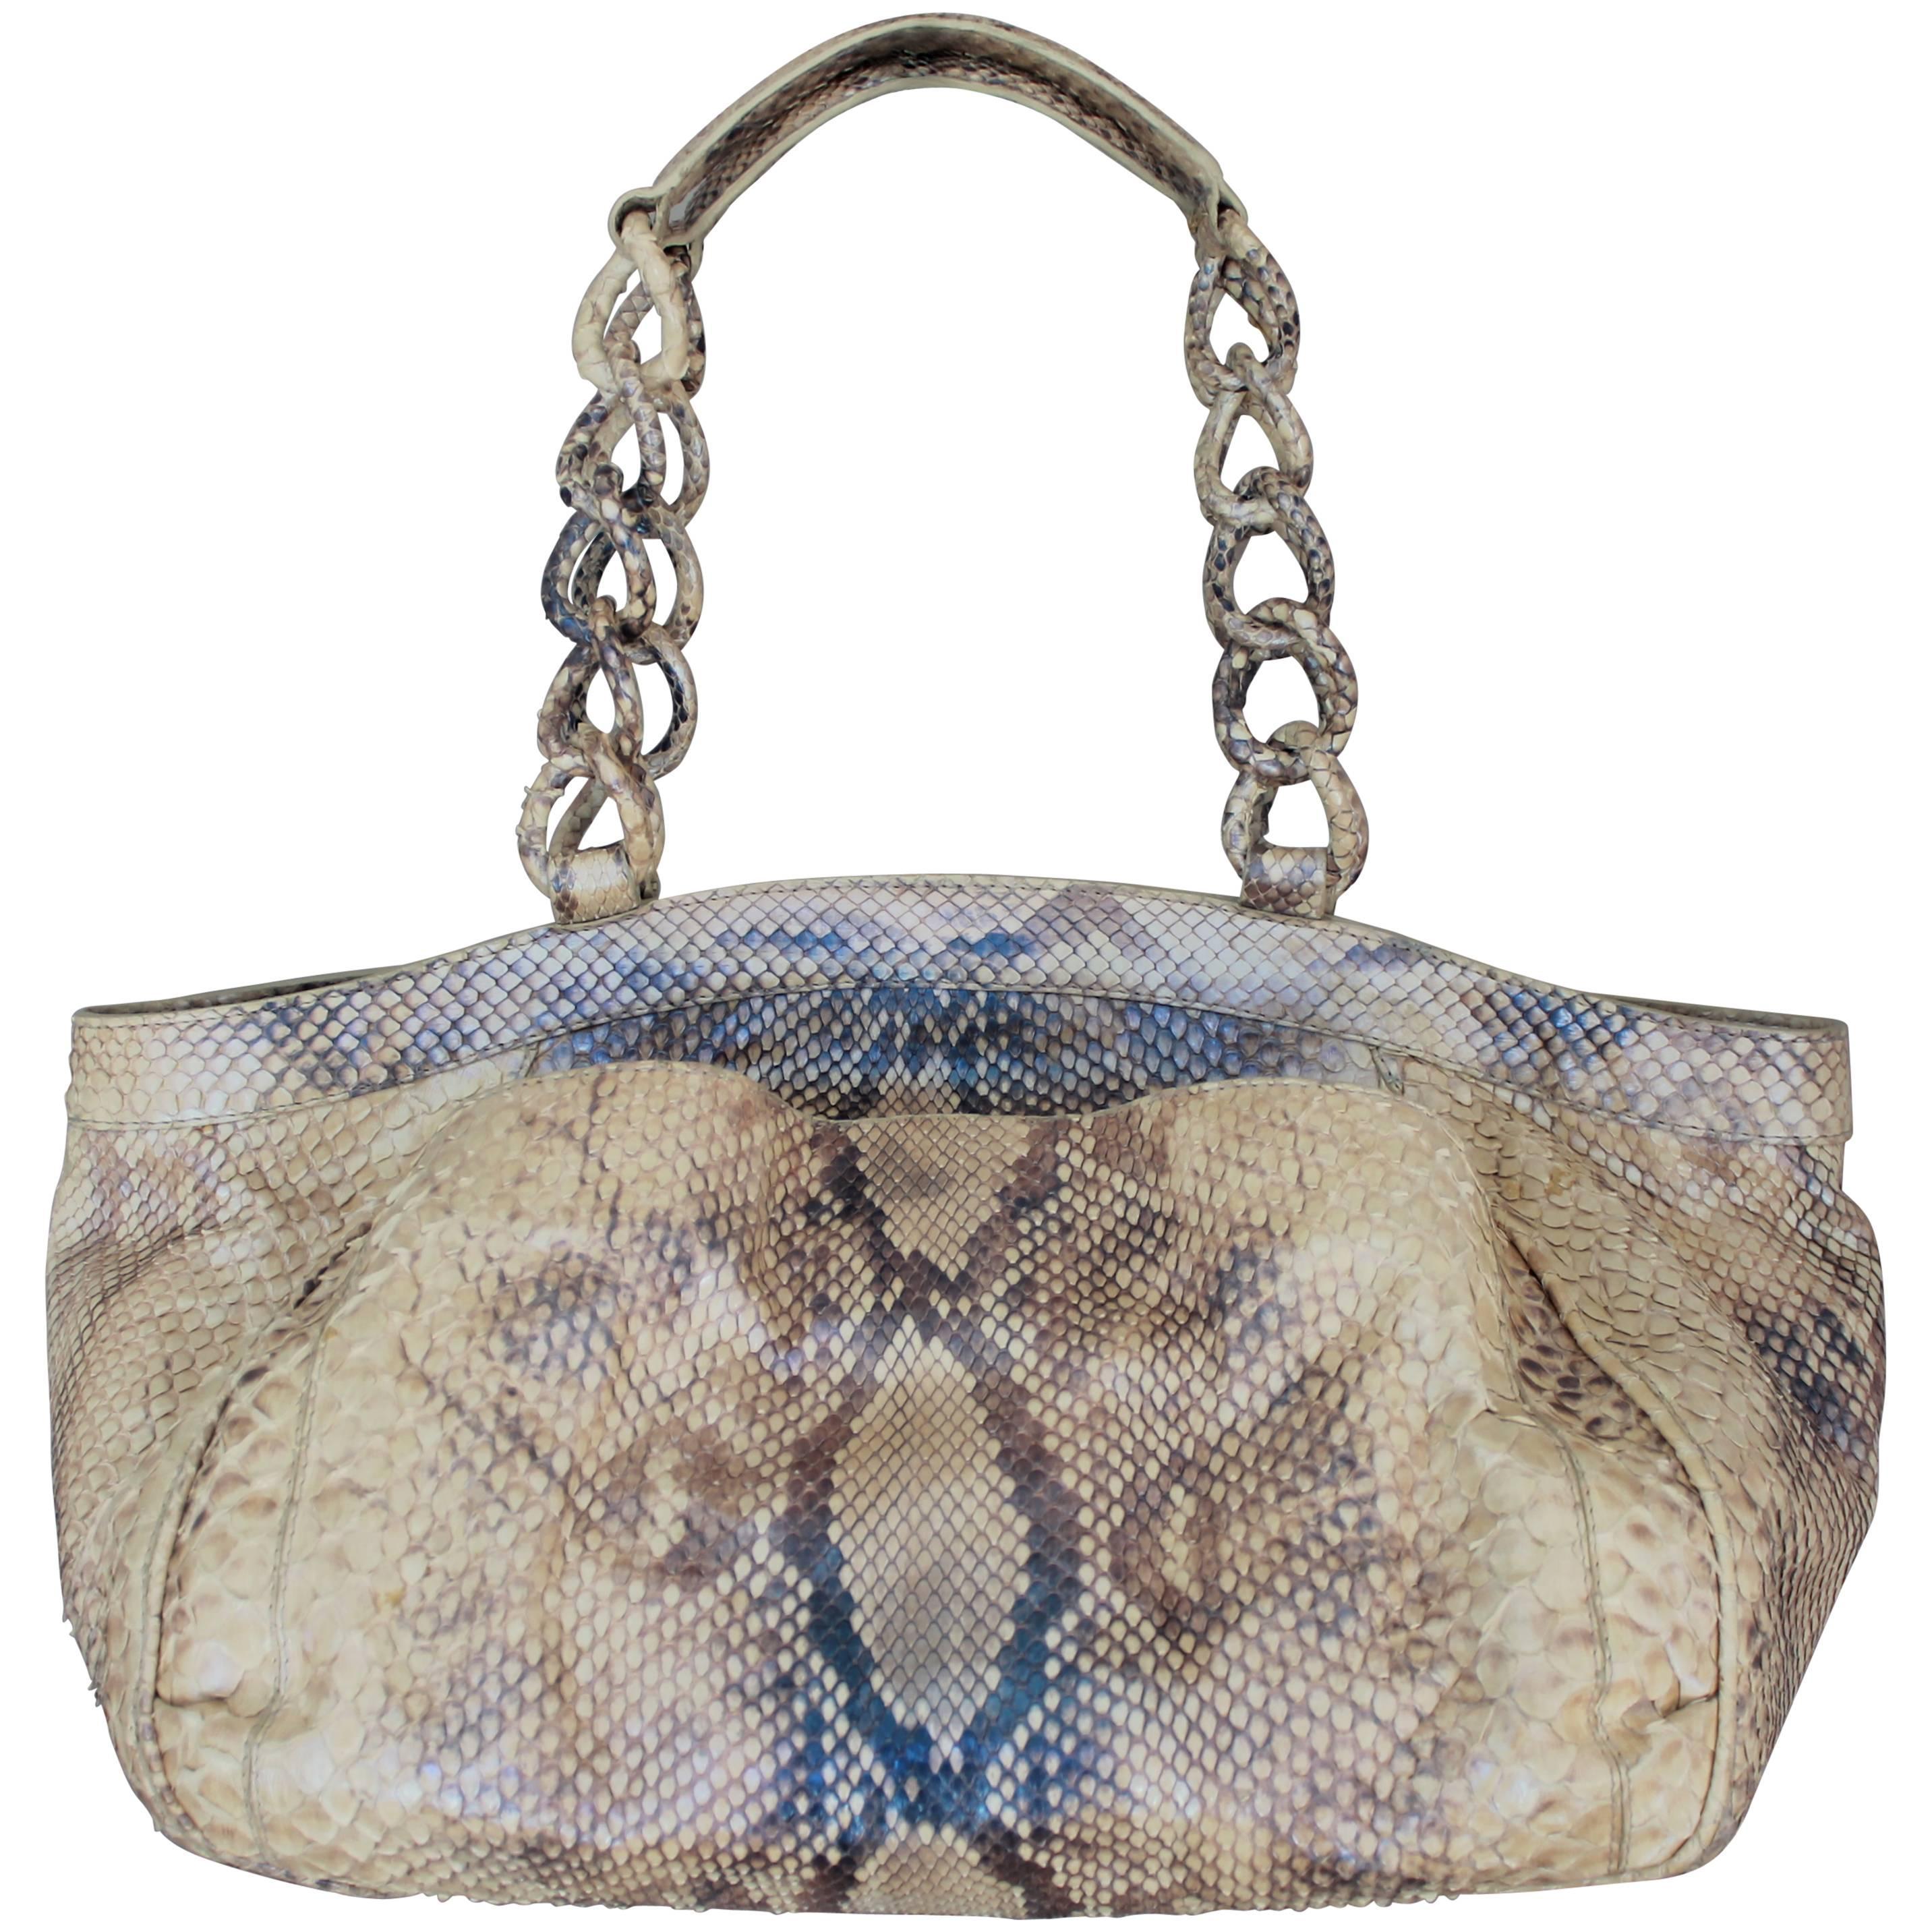 Nancy Gonzalez Earthtone Metallic Python Shoulder Bag 0aHlP